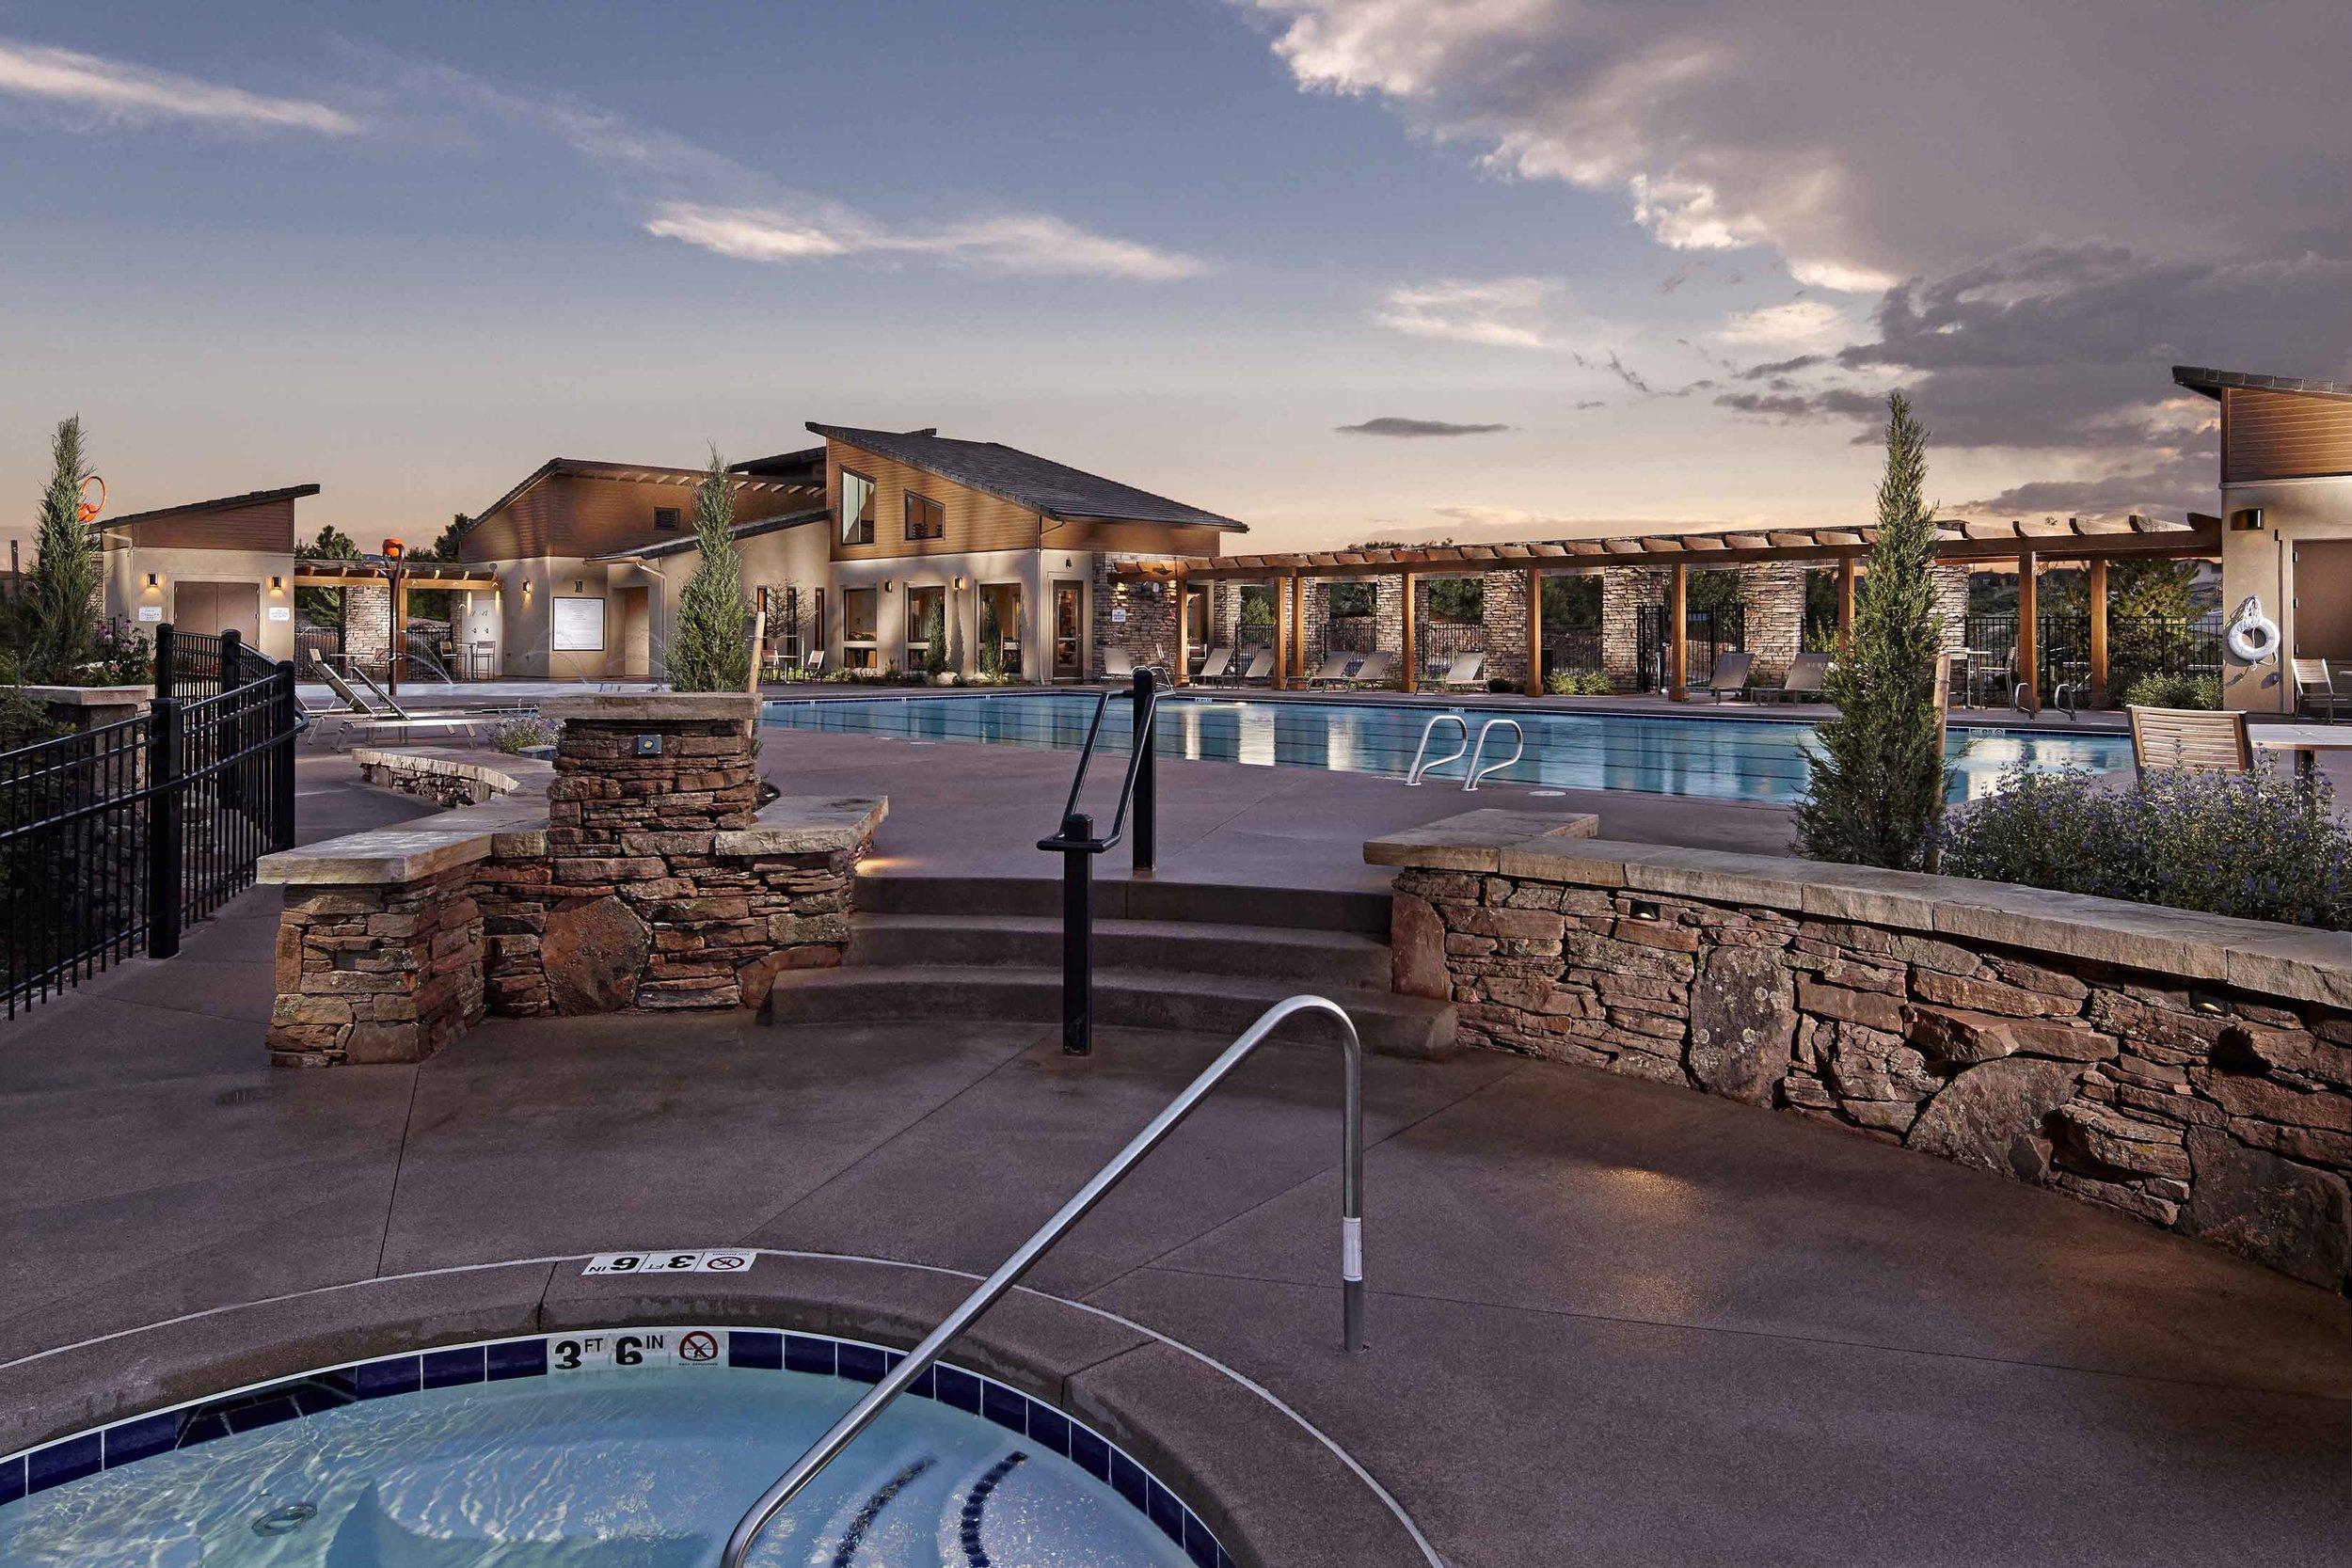 Poolhouse Pool Hot Tub.jpg